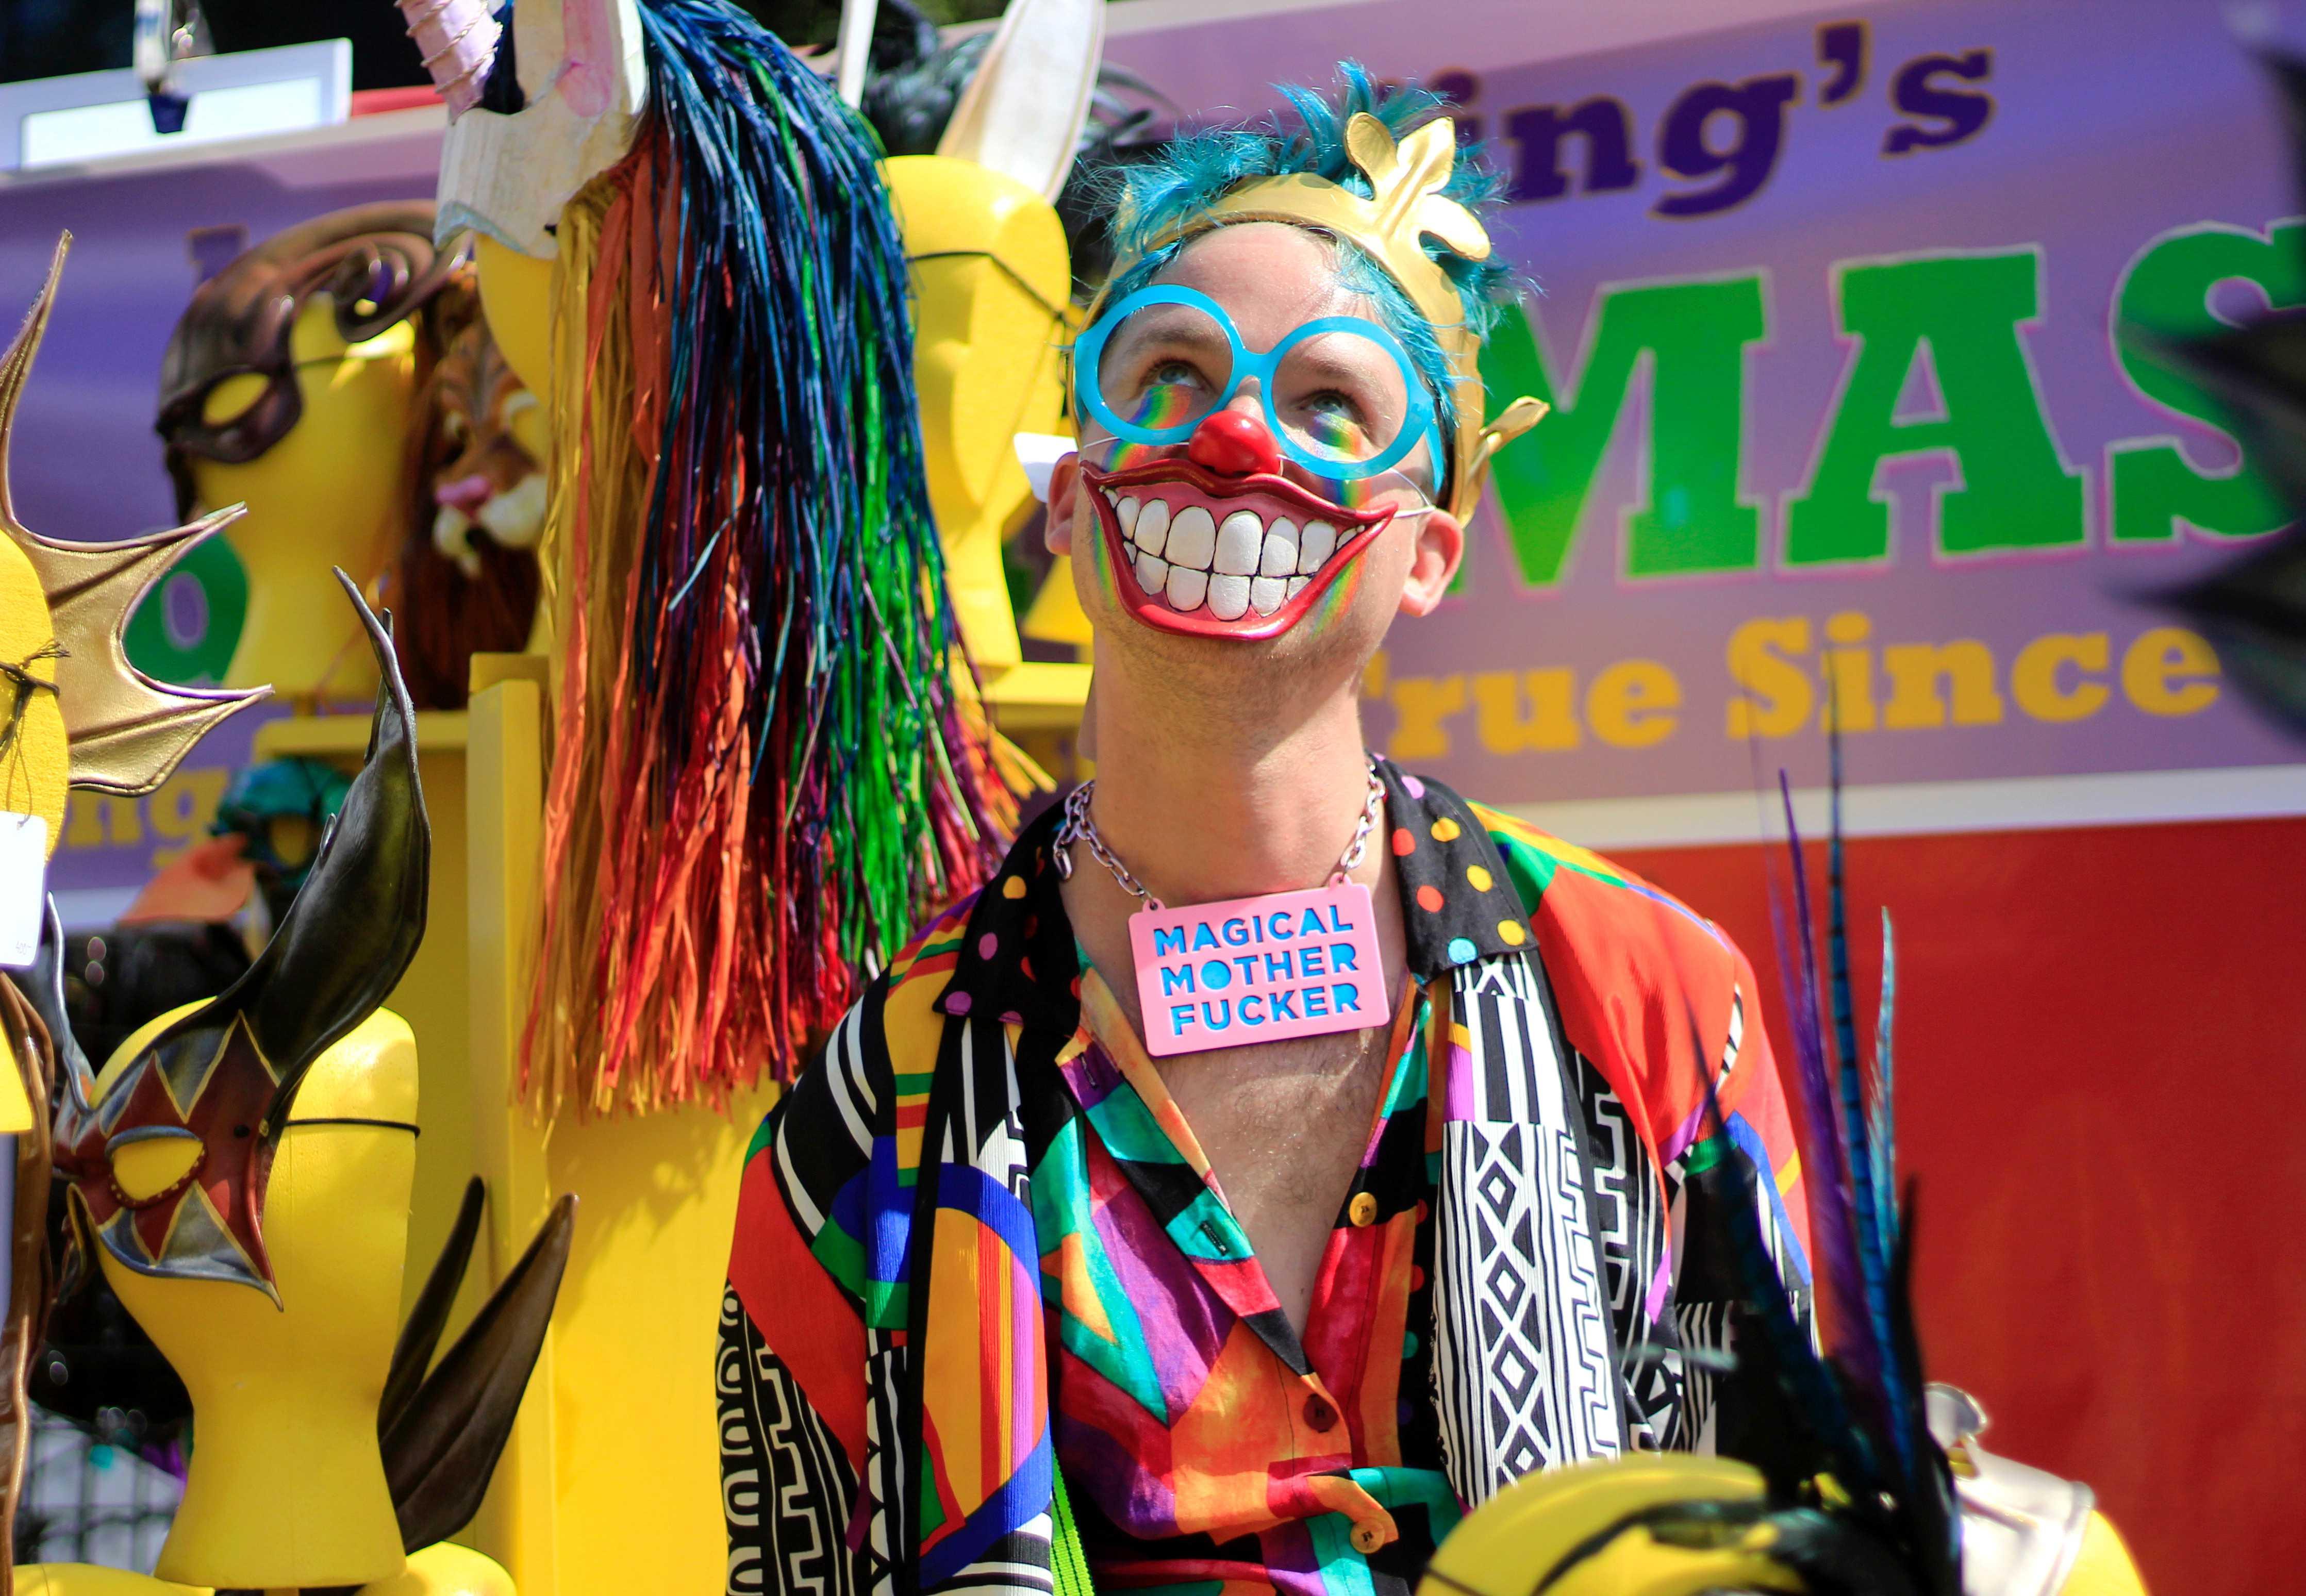 San Francisco's Folsom Street Fair reinforces consent